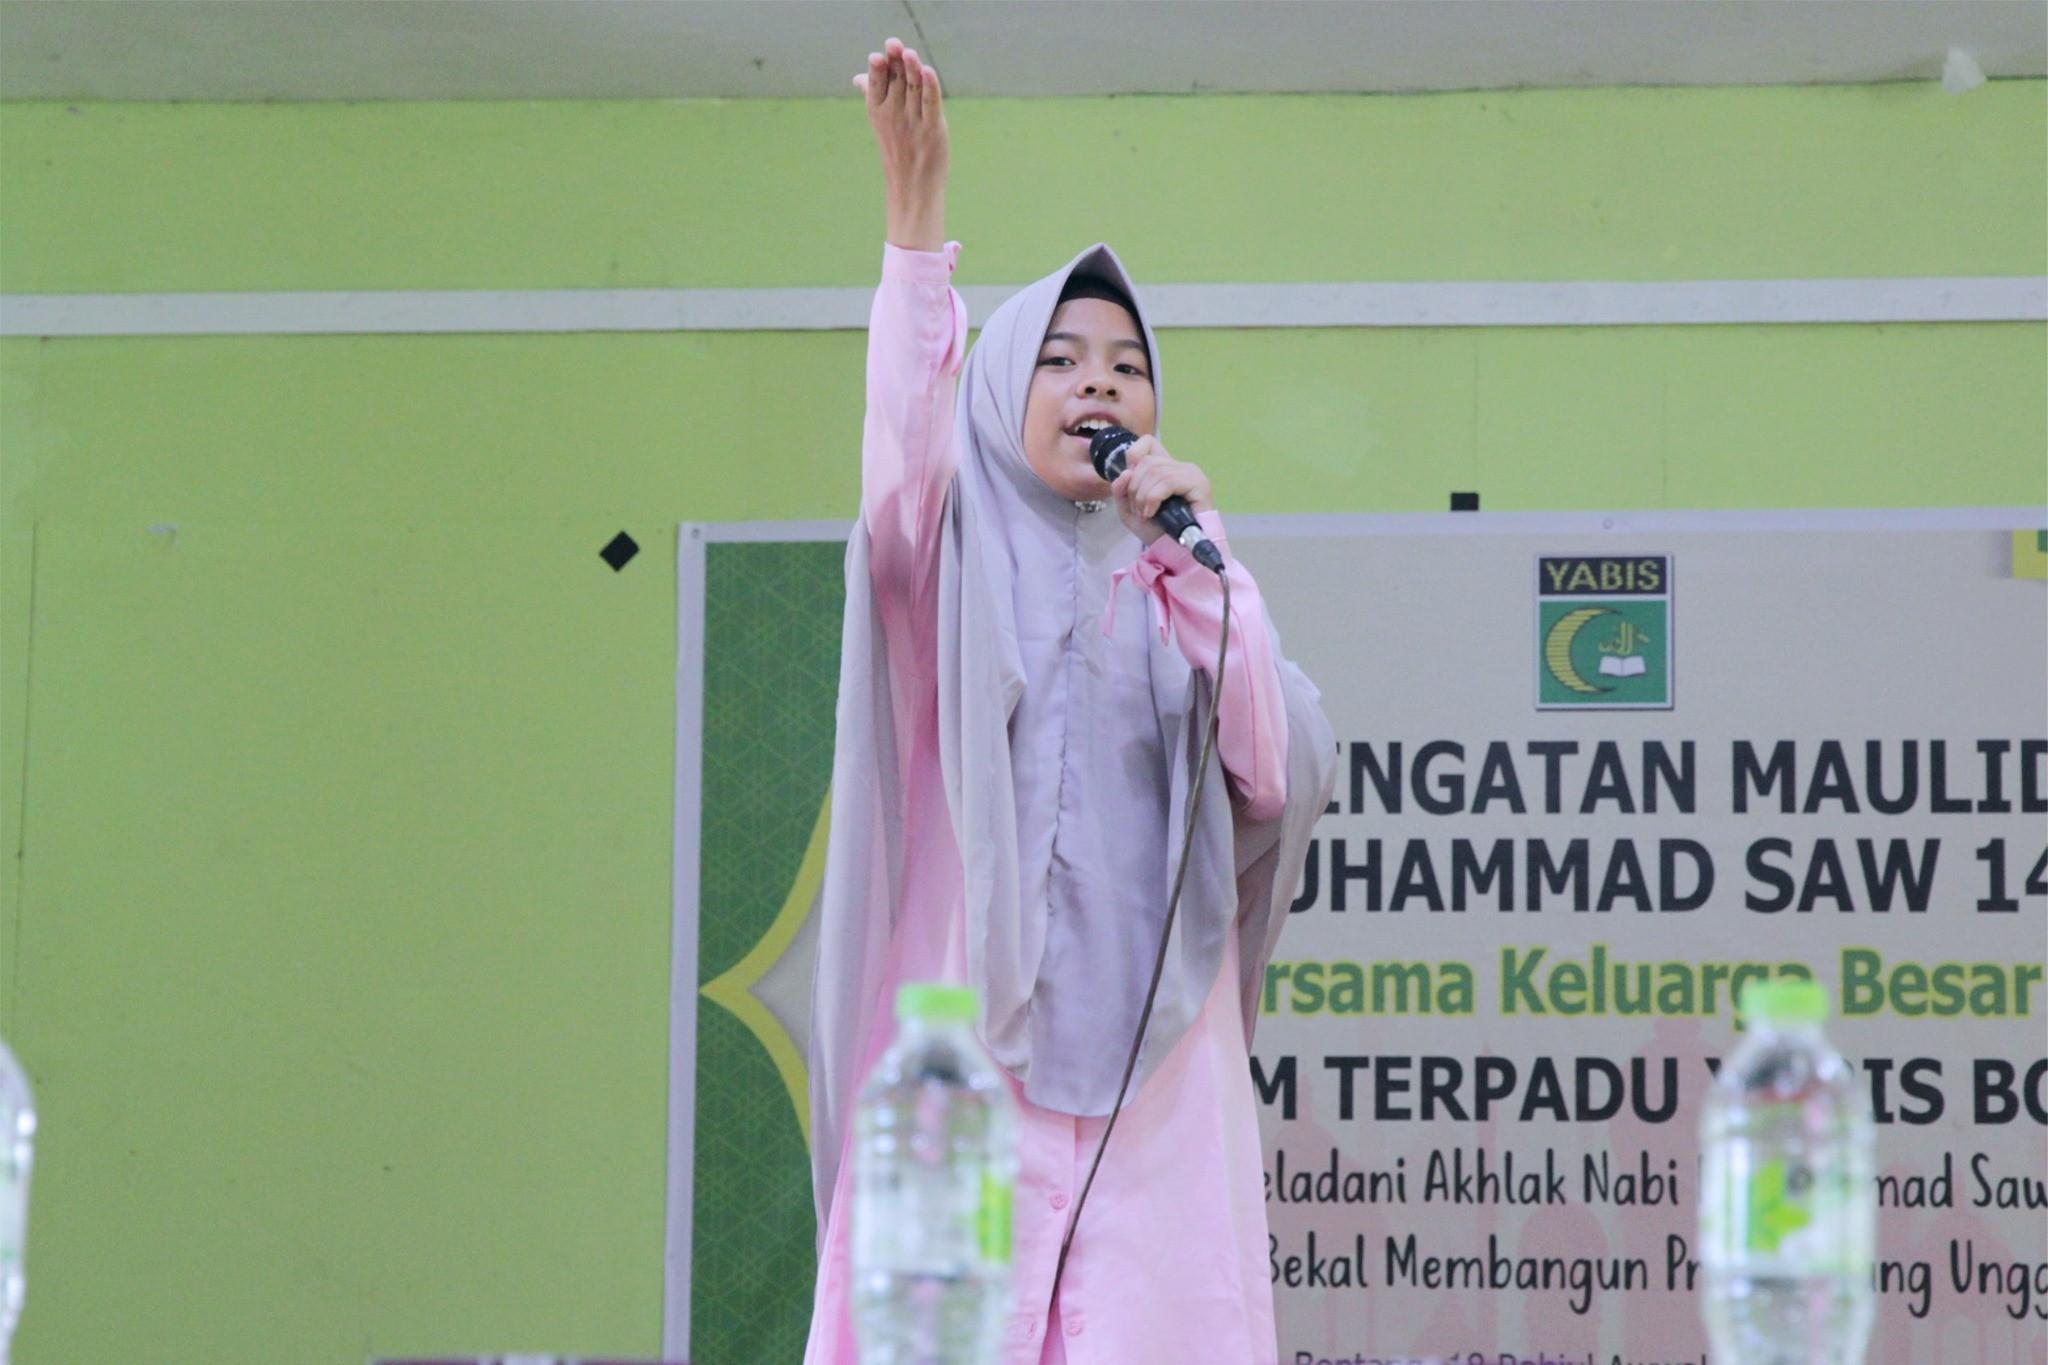 Teladani Akhlak Nabi Muhammad, SMP IT YABIS Gelar Maulid Nabi